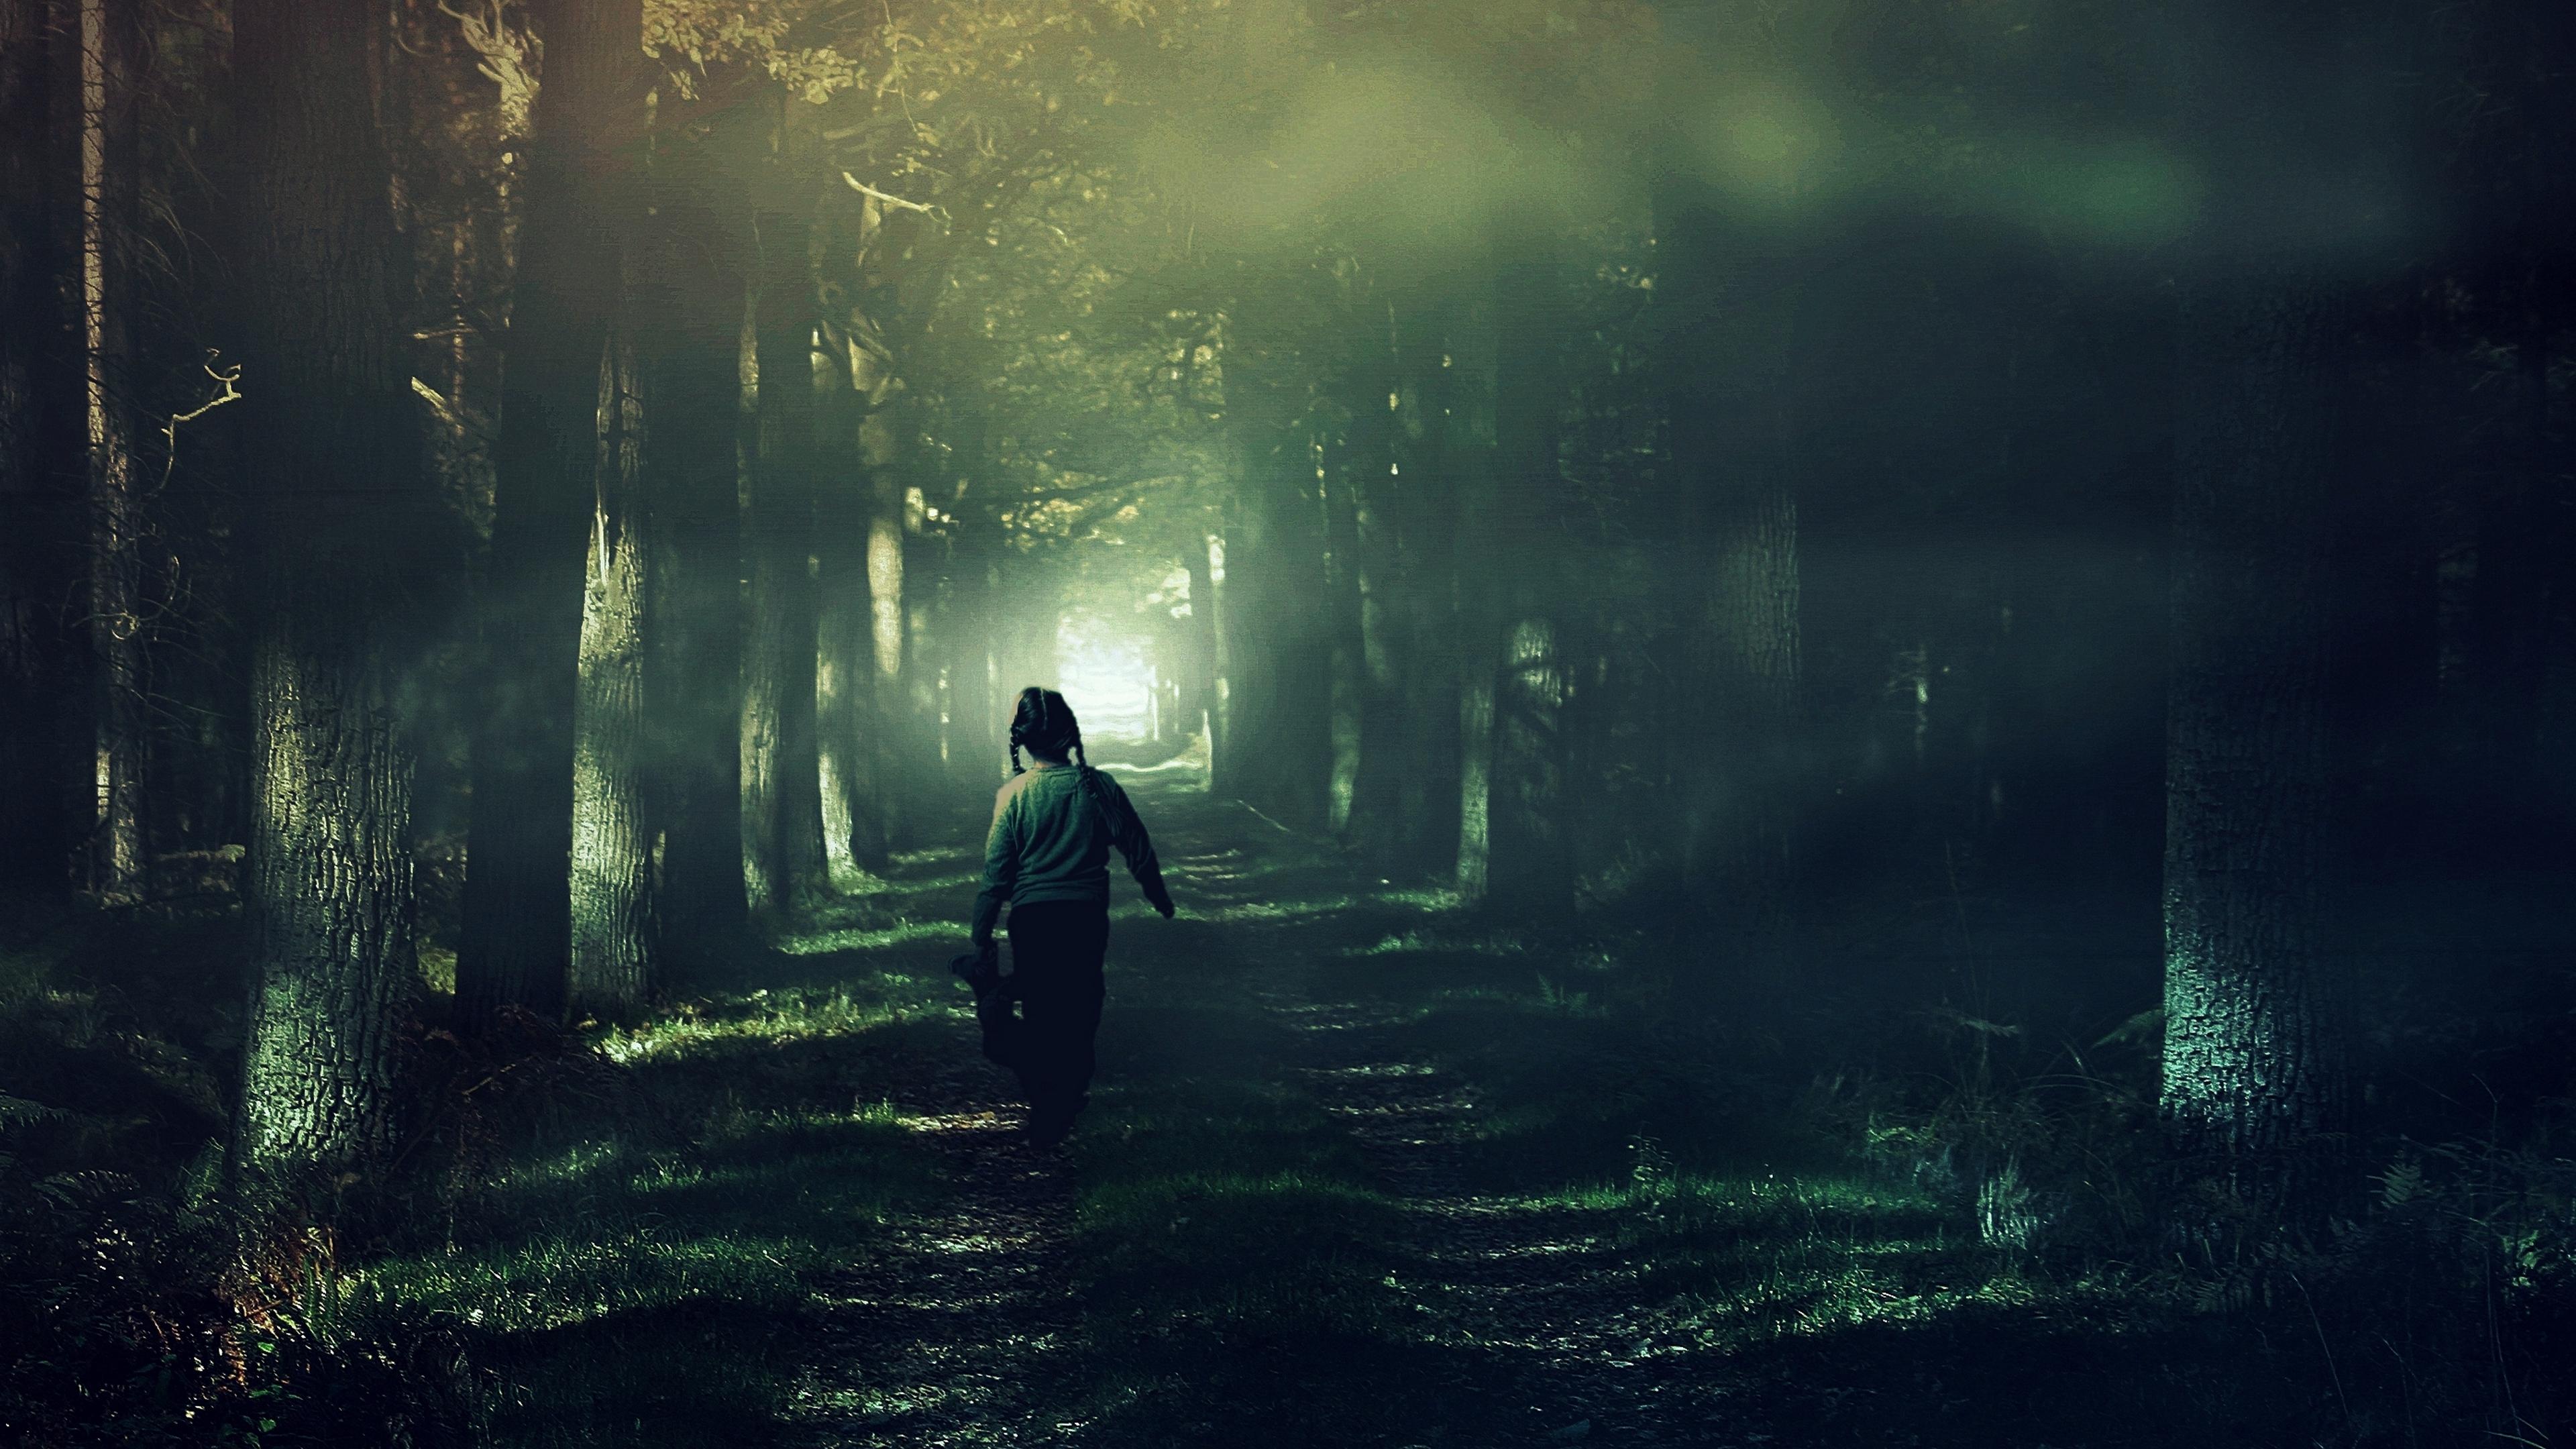 child forest fog walk 4k 1541113485 - child, forest, fog, walk 4k - Forest, fog, child